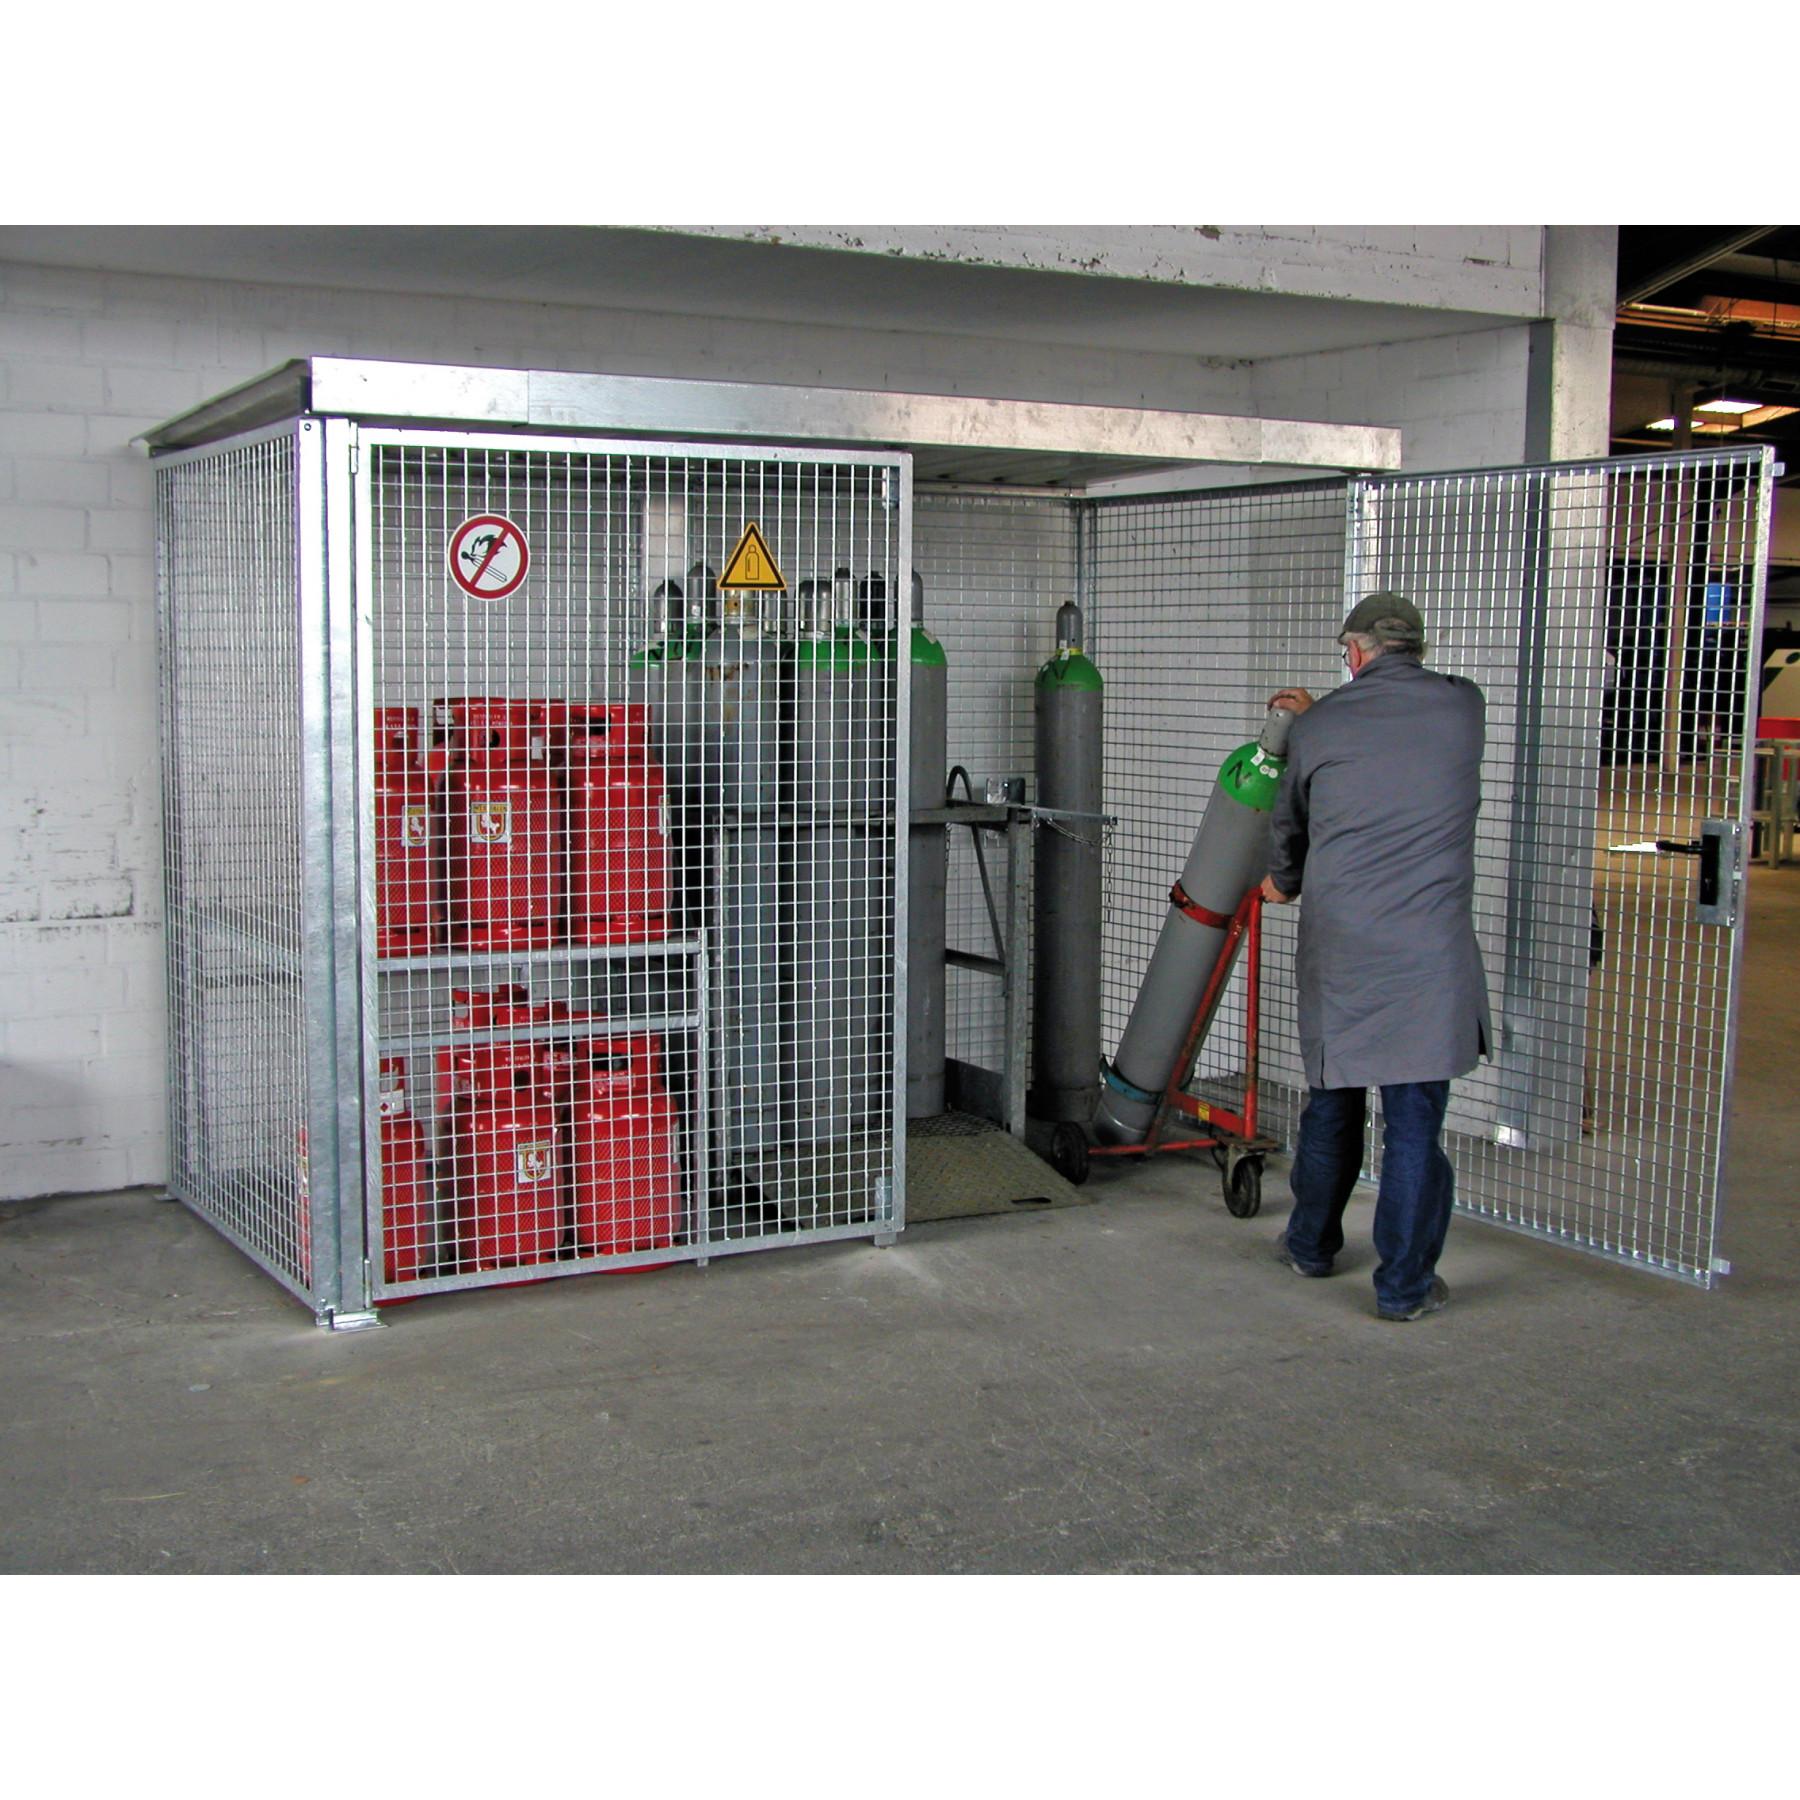 Gasflessencontainer voor buitenopslag van gasflessen, dubbele vleugeldeur